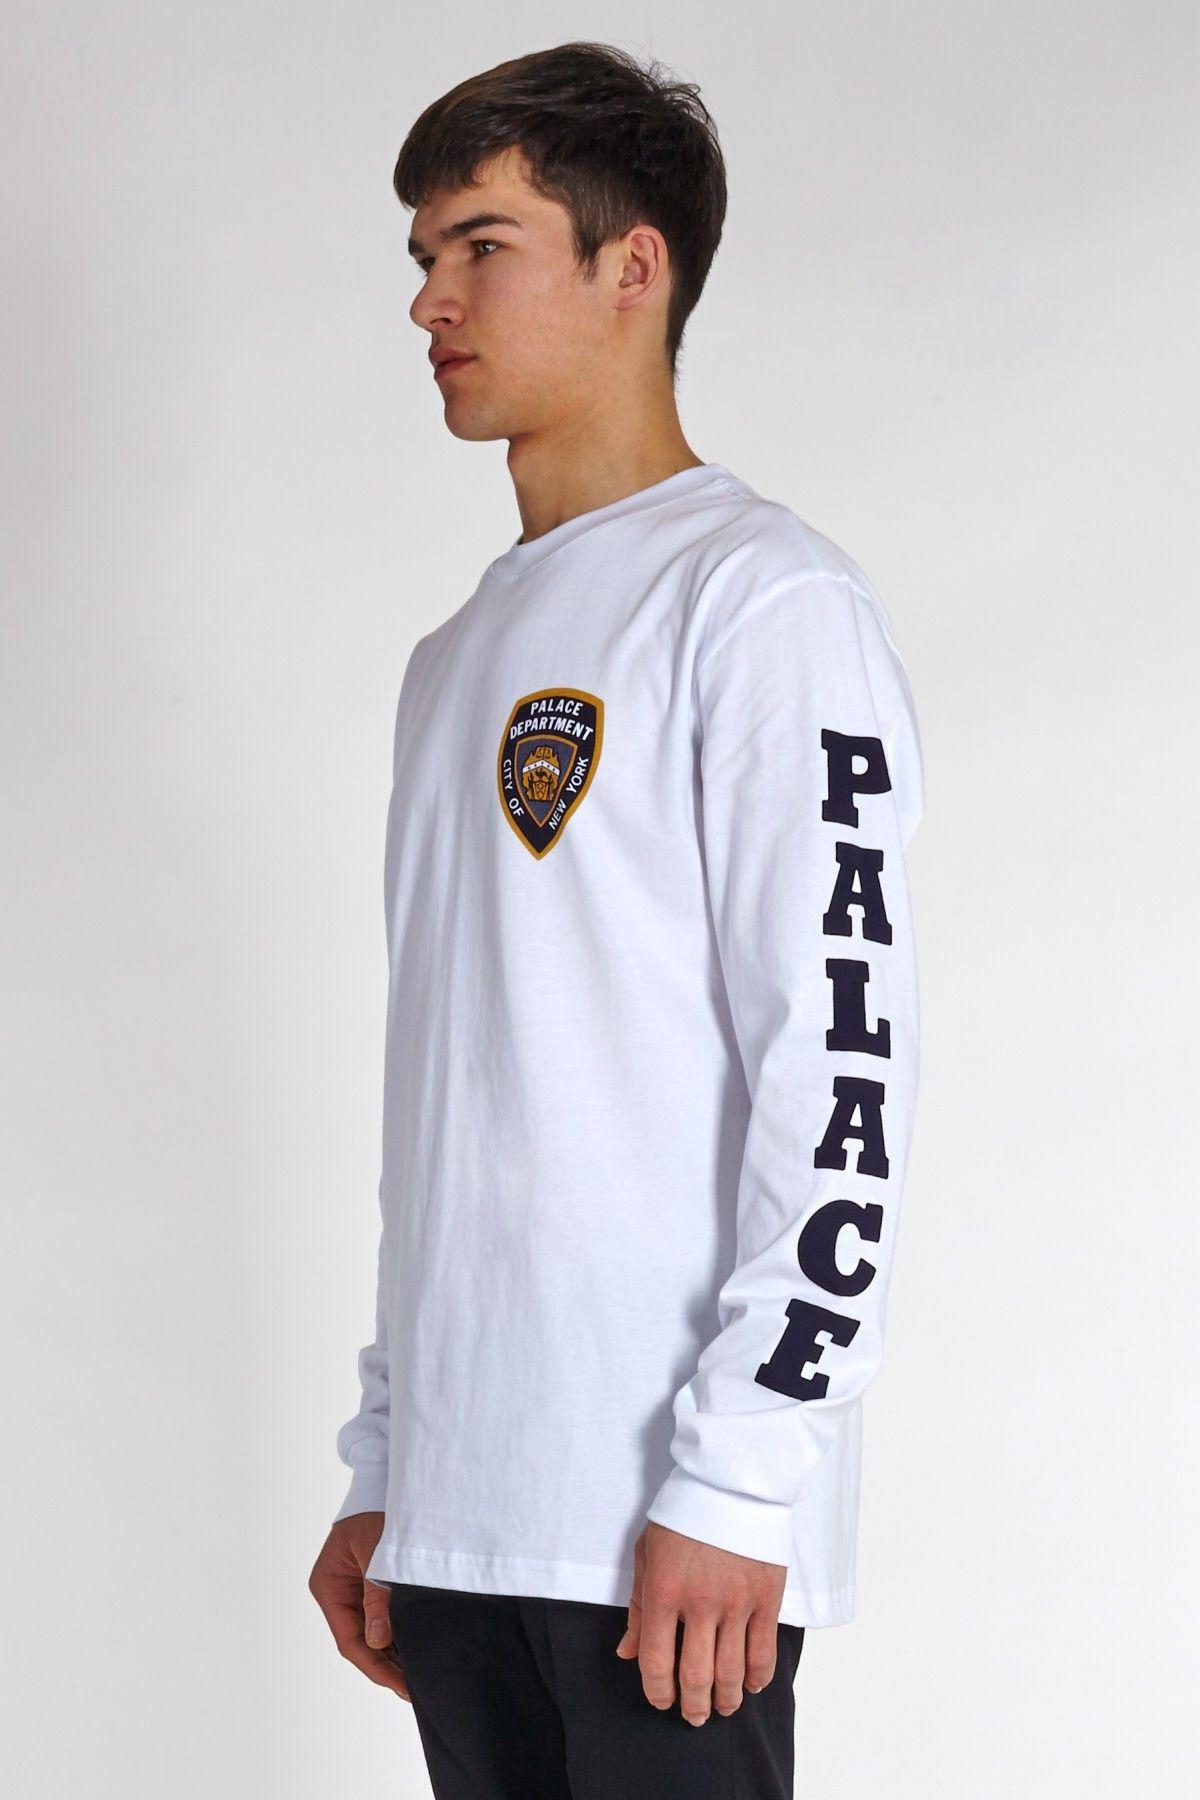 Palace Skateboards Department Long Sleeve T-Shirt White  £37